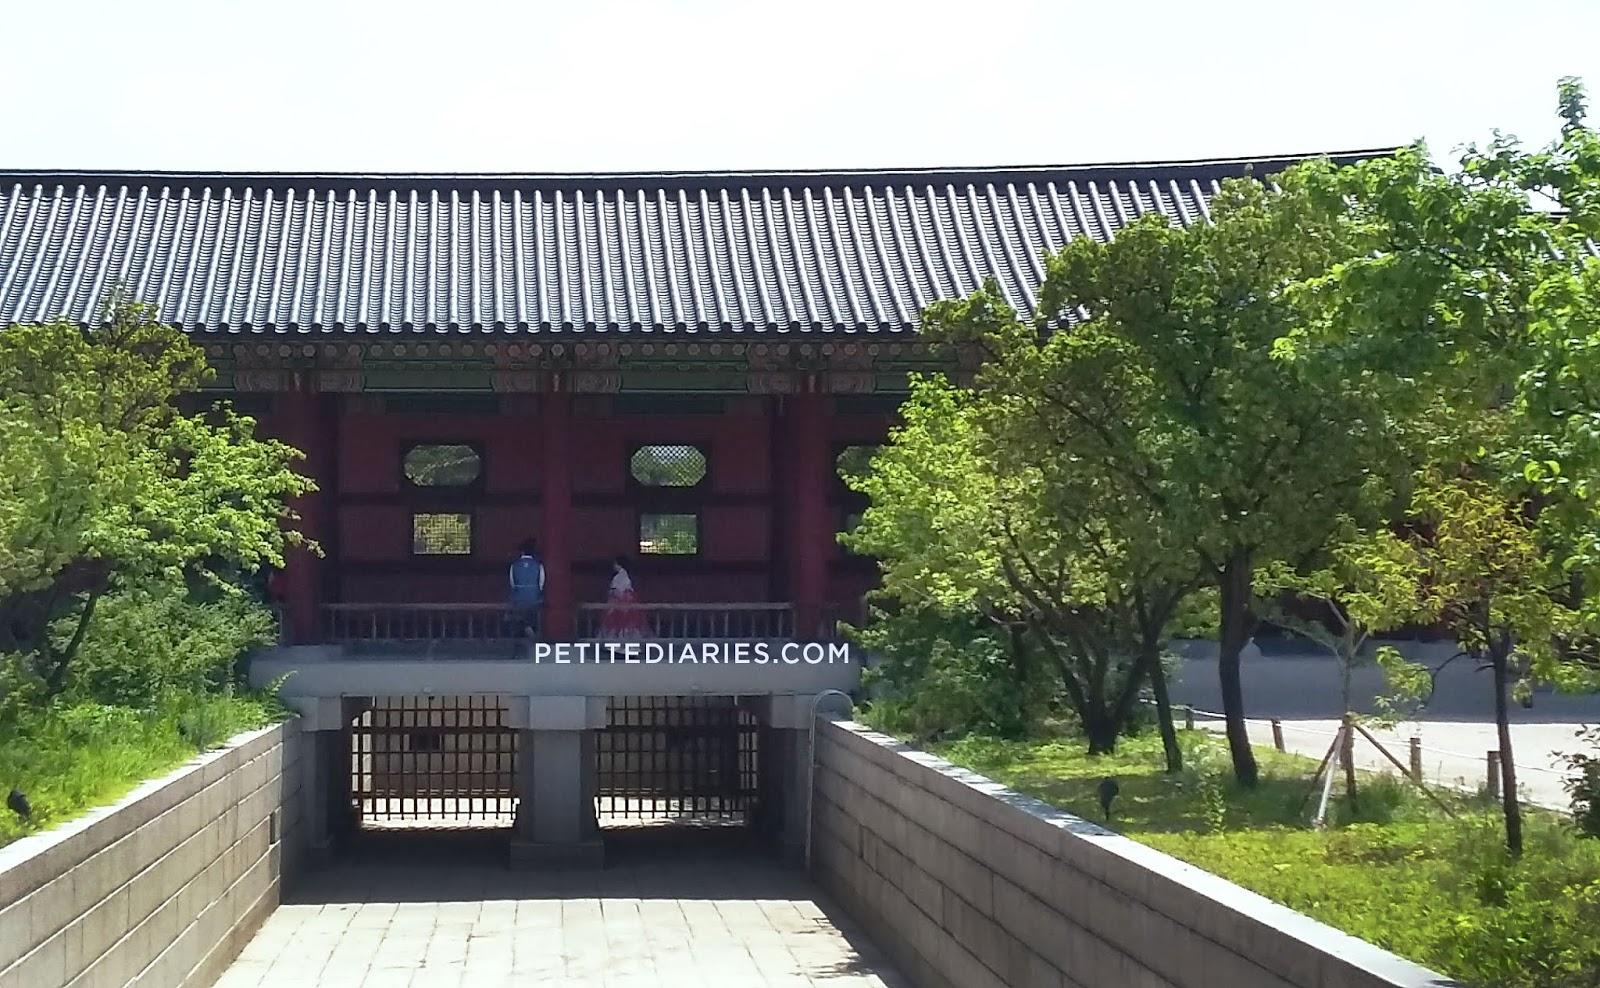 gyeongbokgung seoul visit